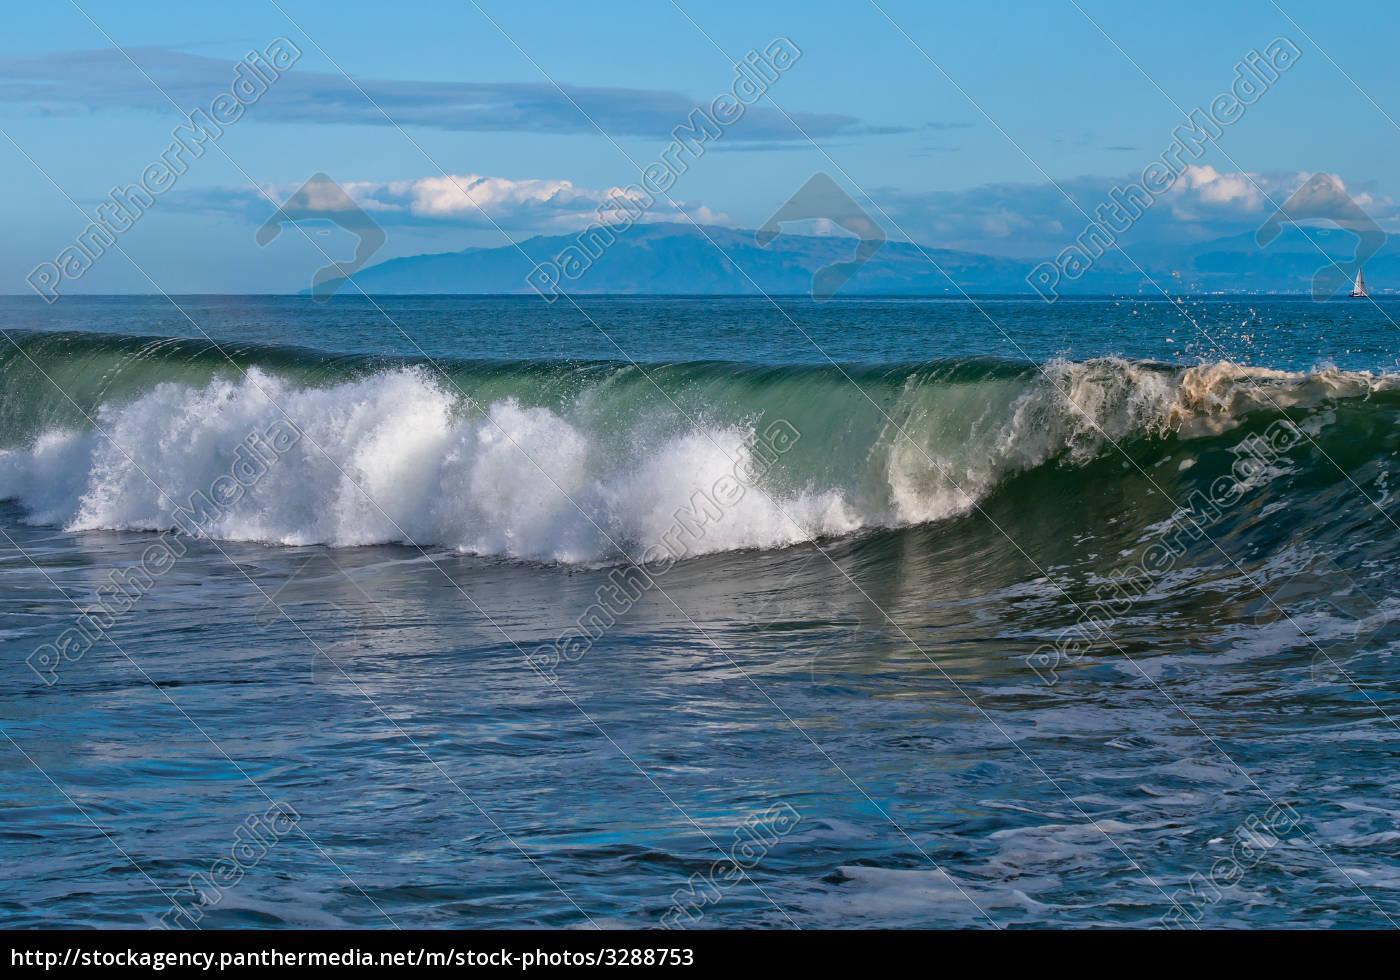 wave - 3288753